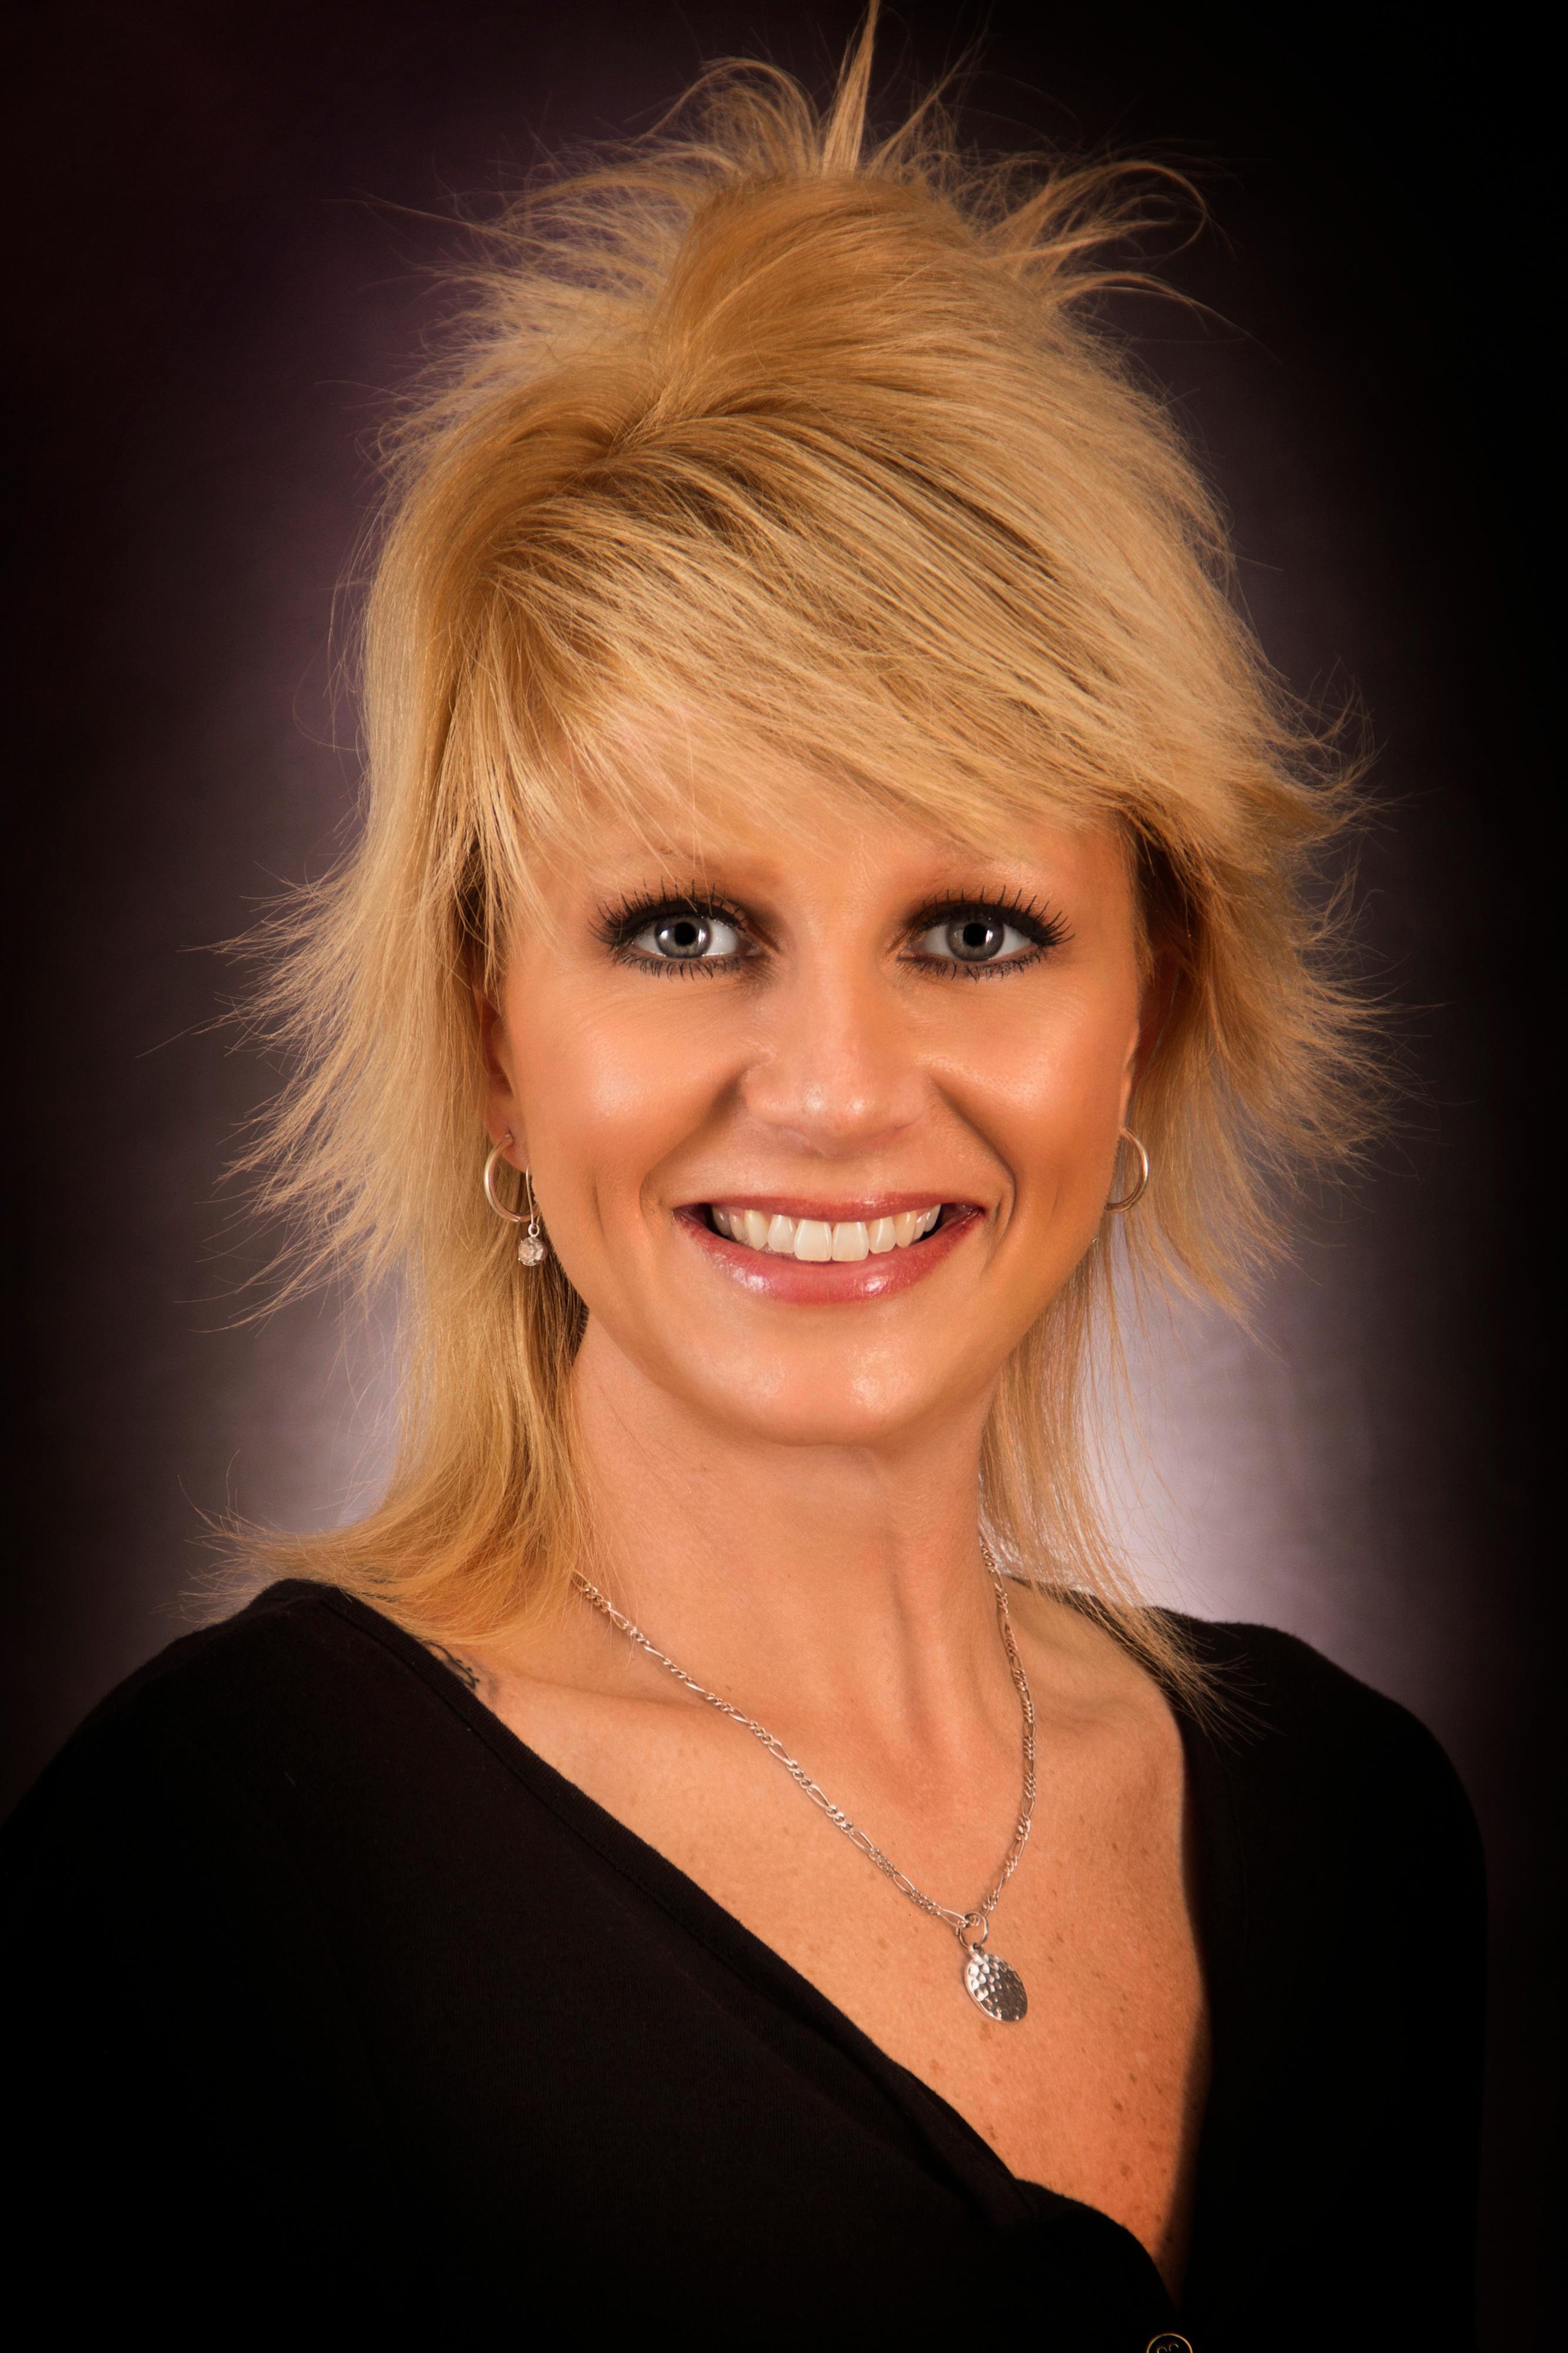 Nicole Bowen